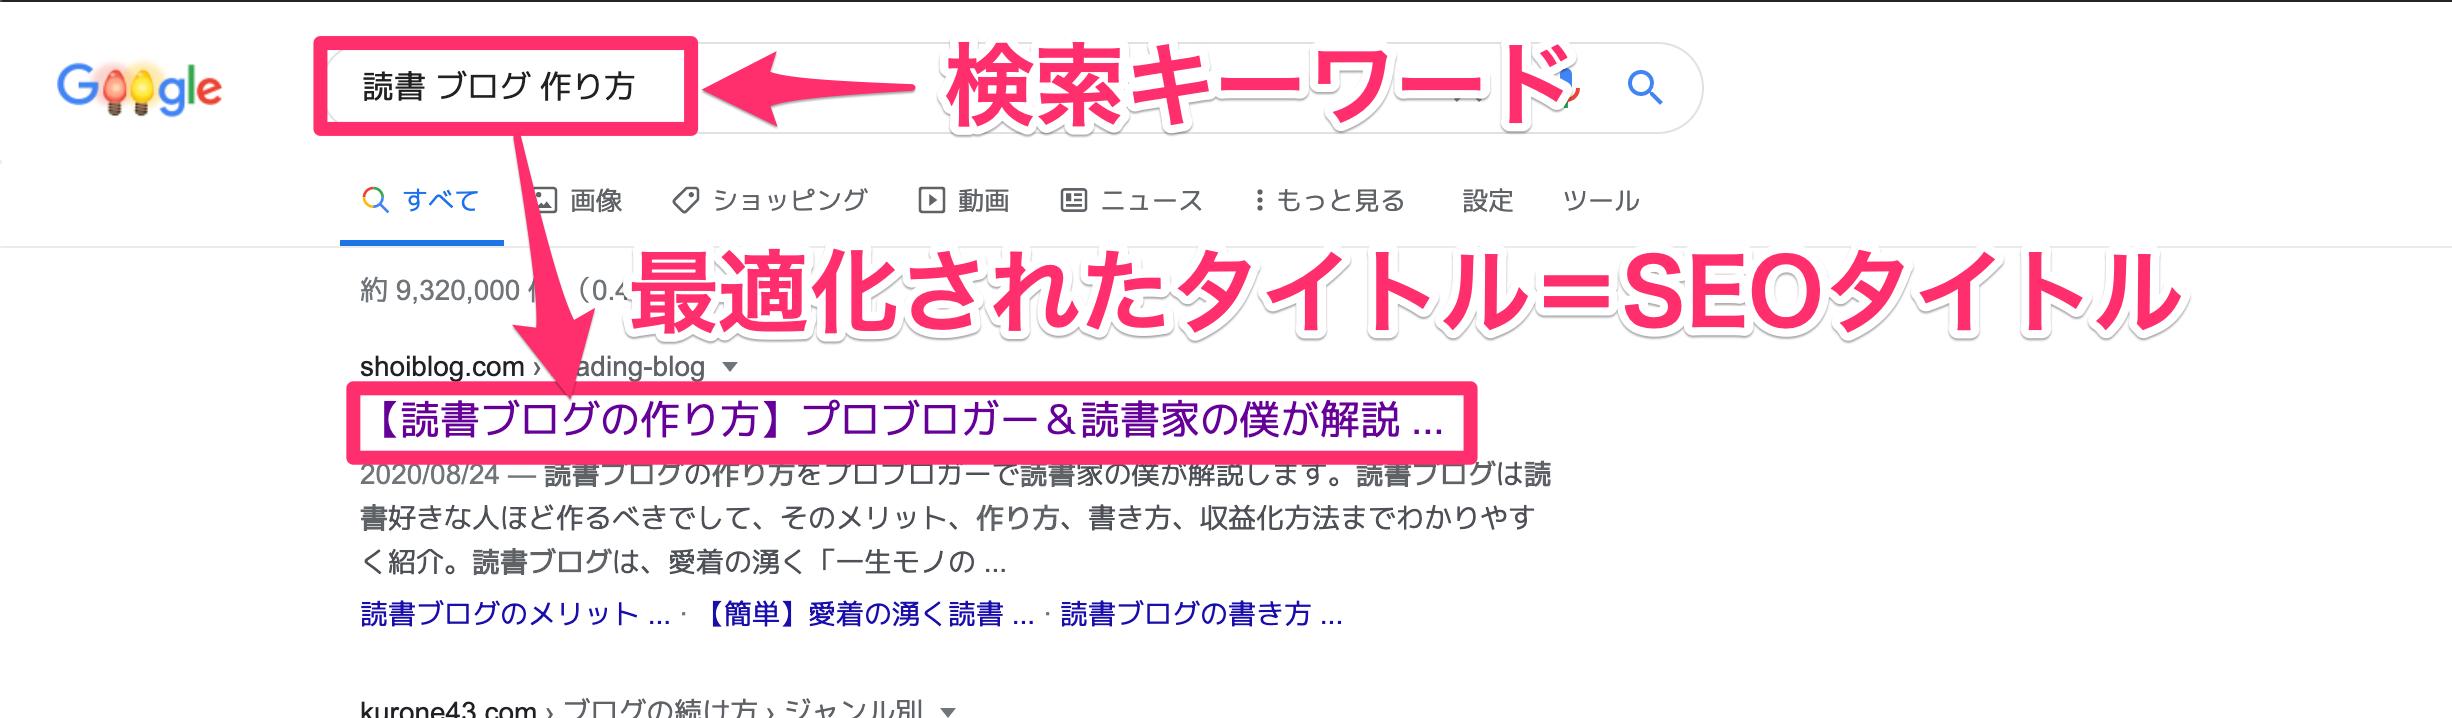 seo タイトル 文字数 とは wordpress ブログ コツ